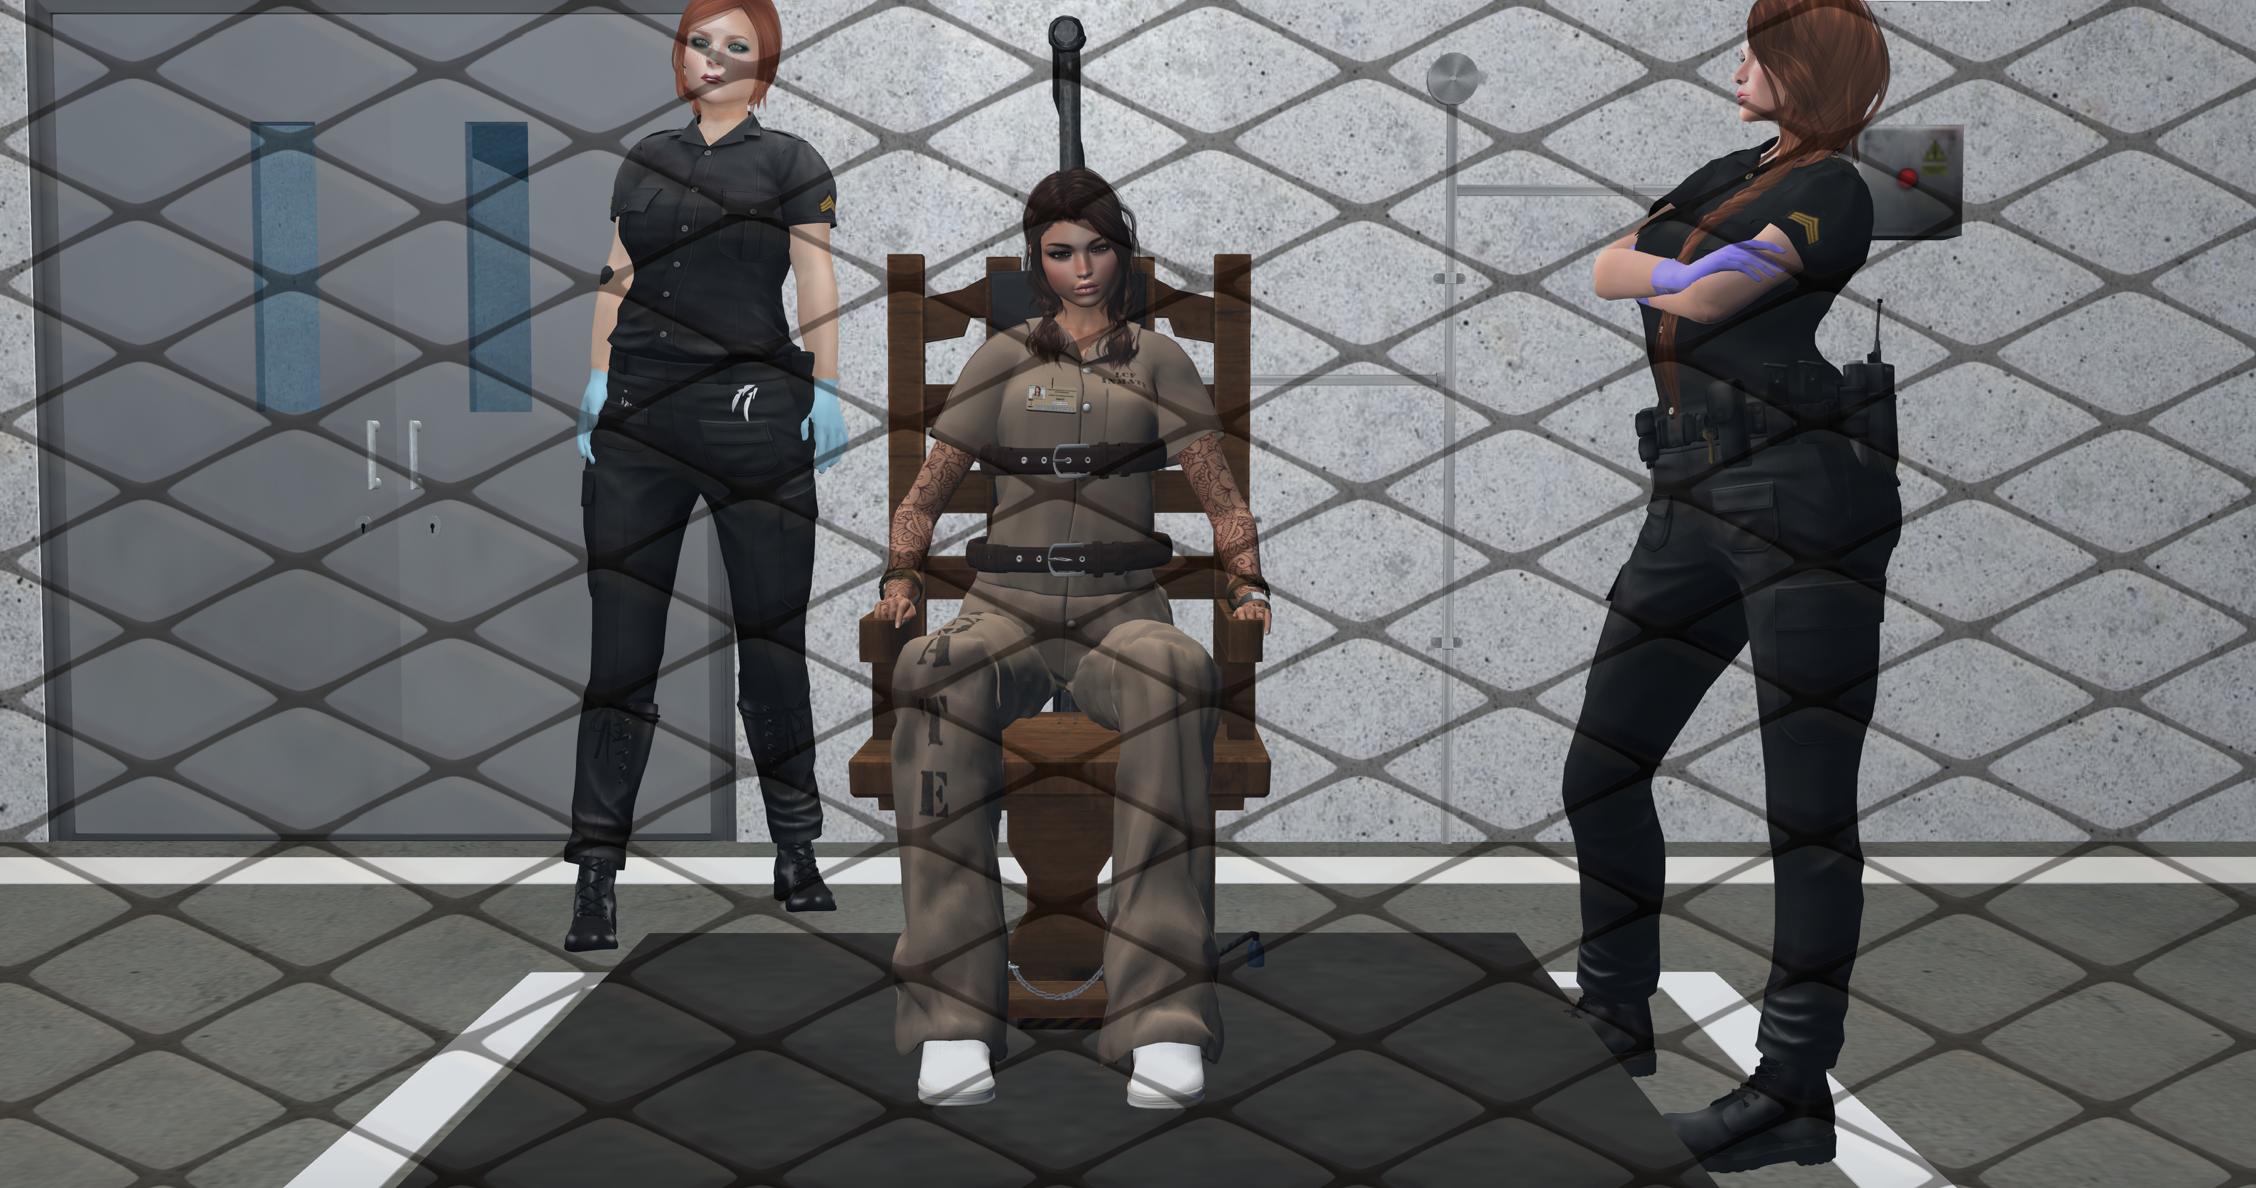 Liddell Correctional Facility – The Zap-Zap chair